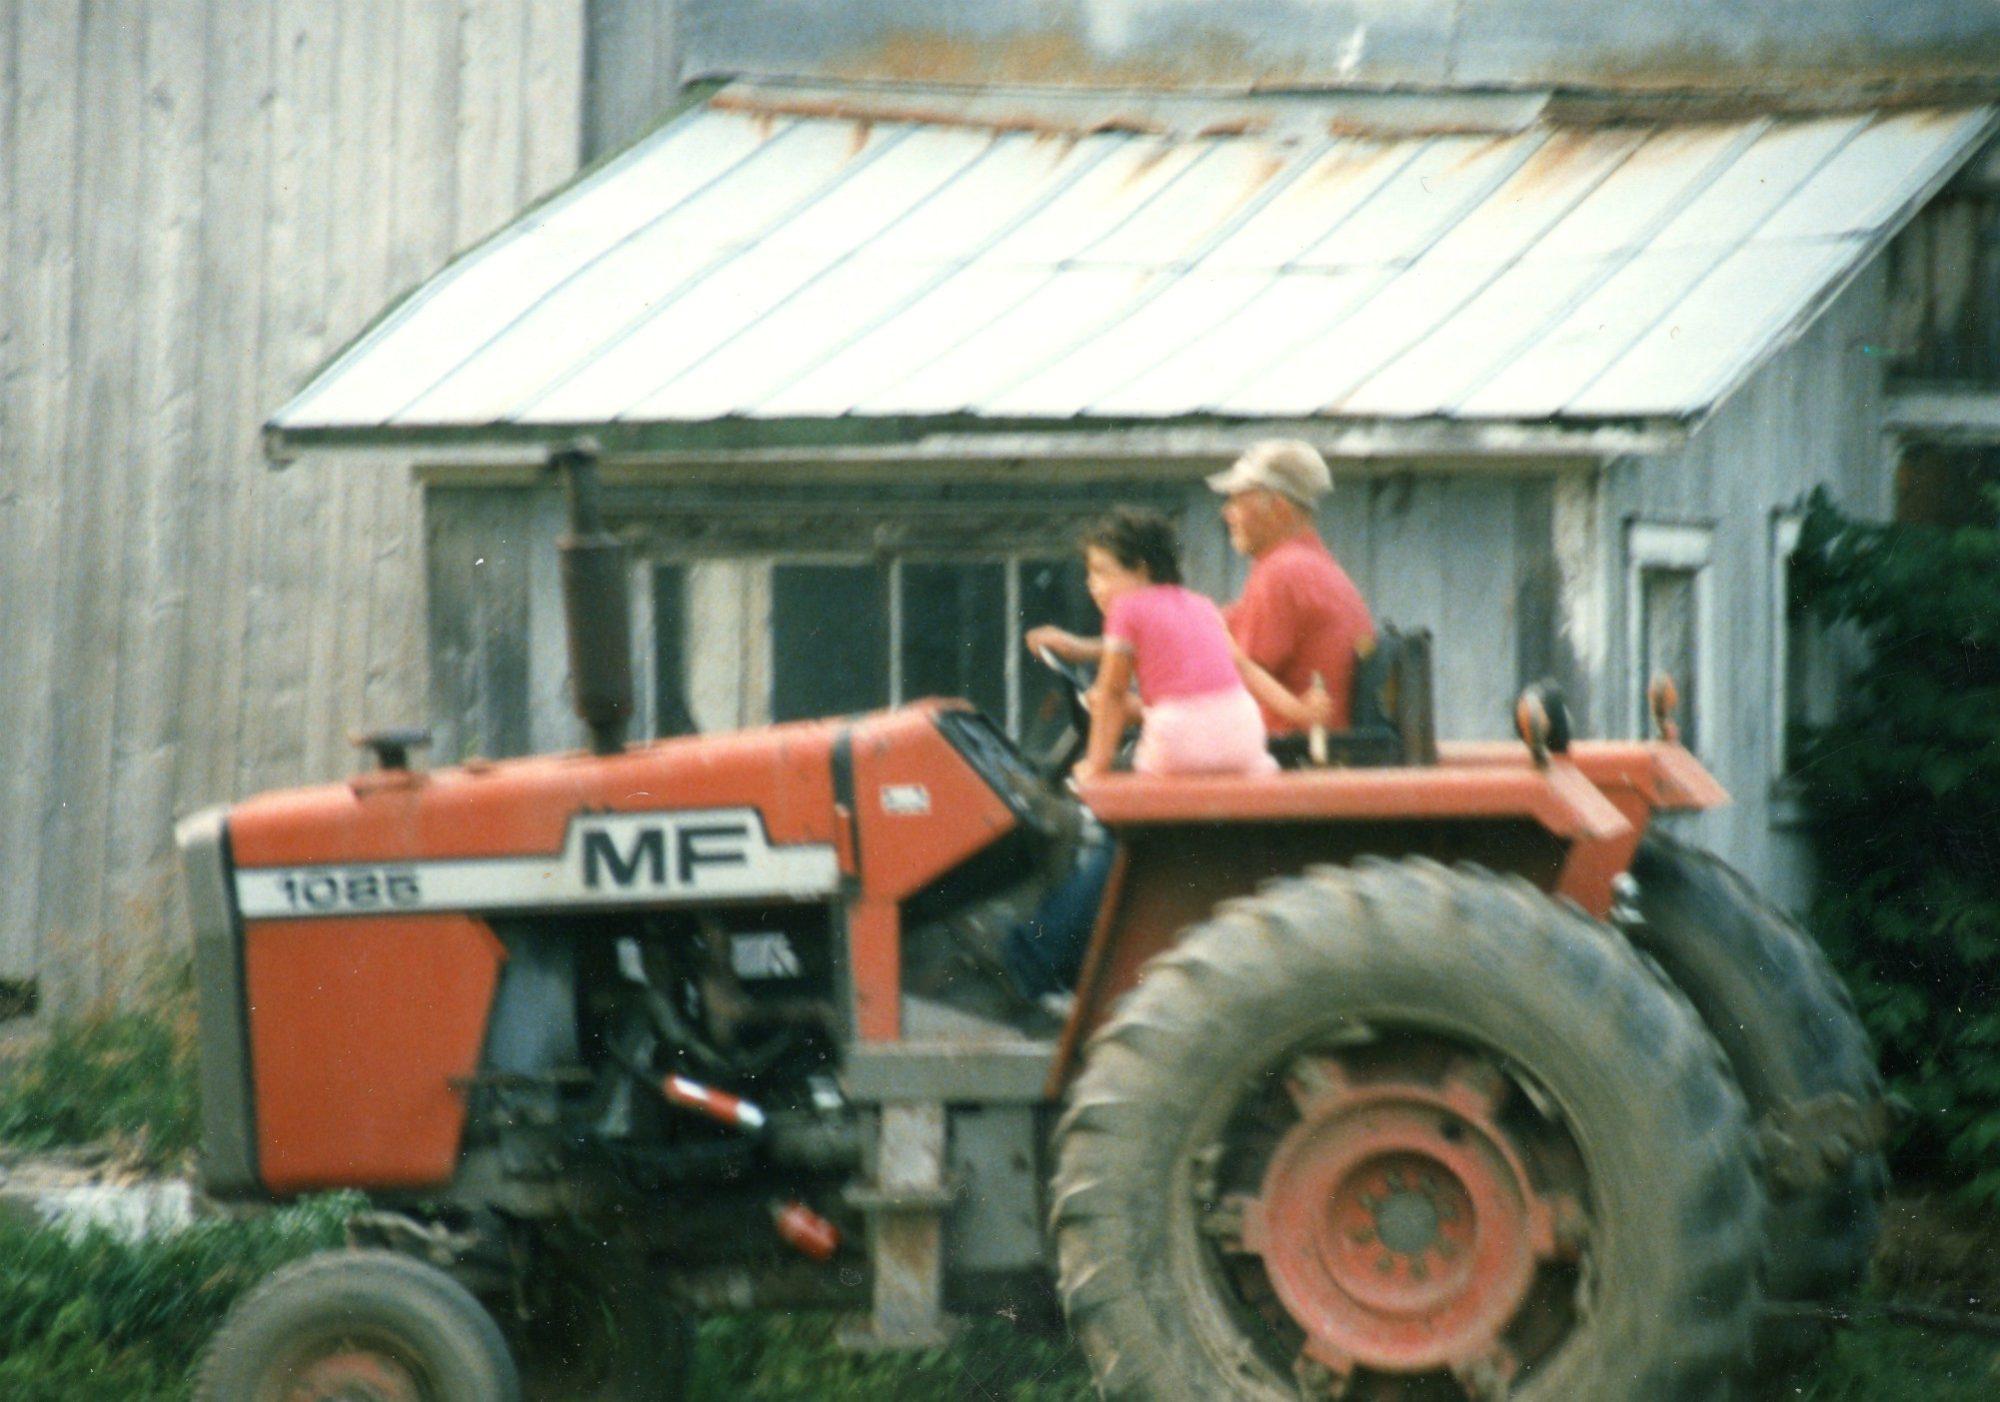 Driving a Massey Ferguson 1085 tractor on the Cuthbert Farm in Hammond